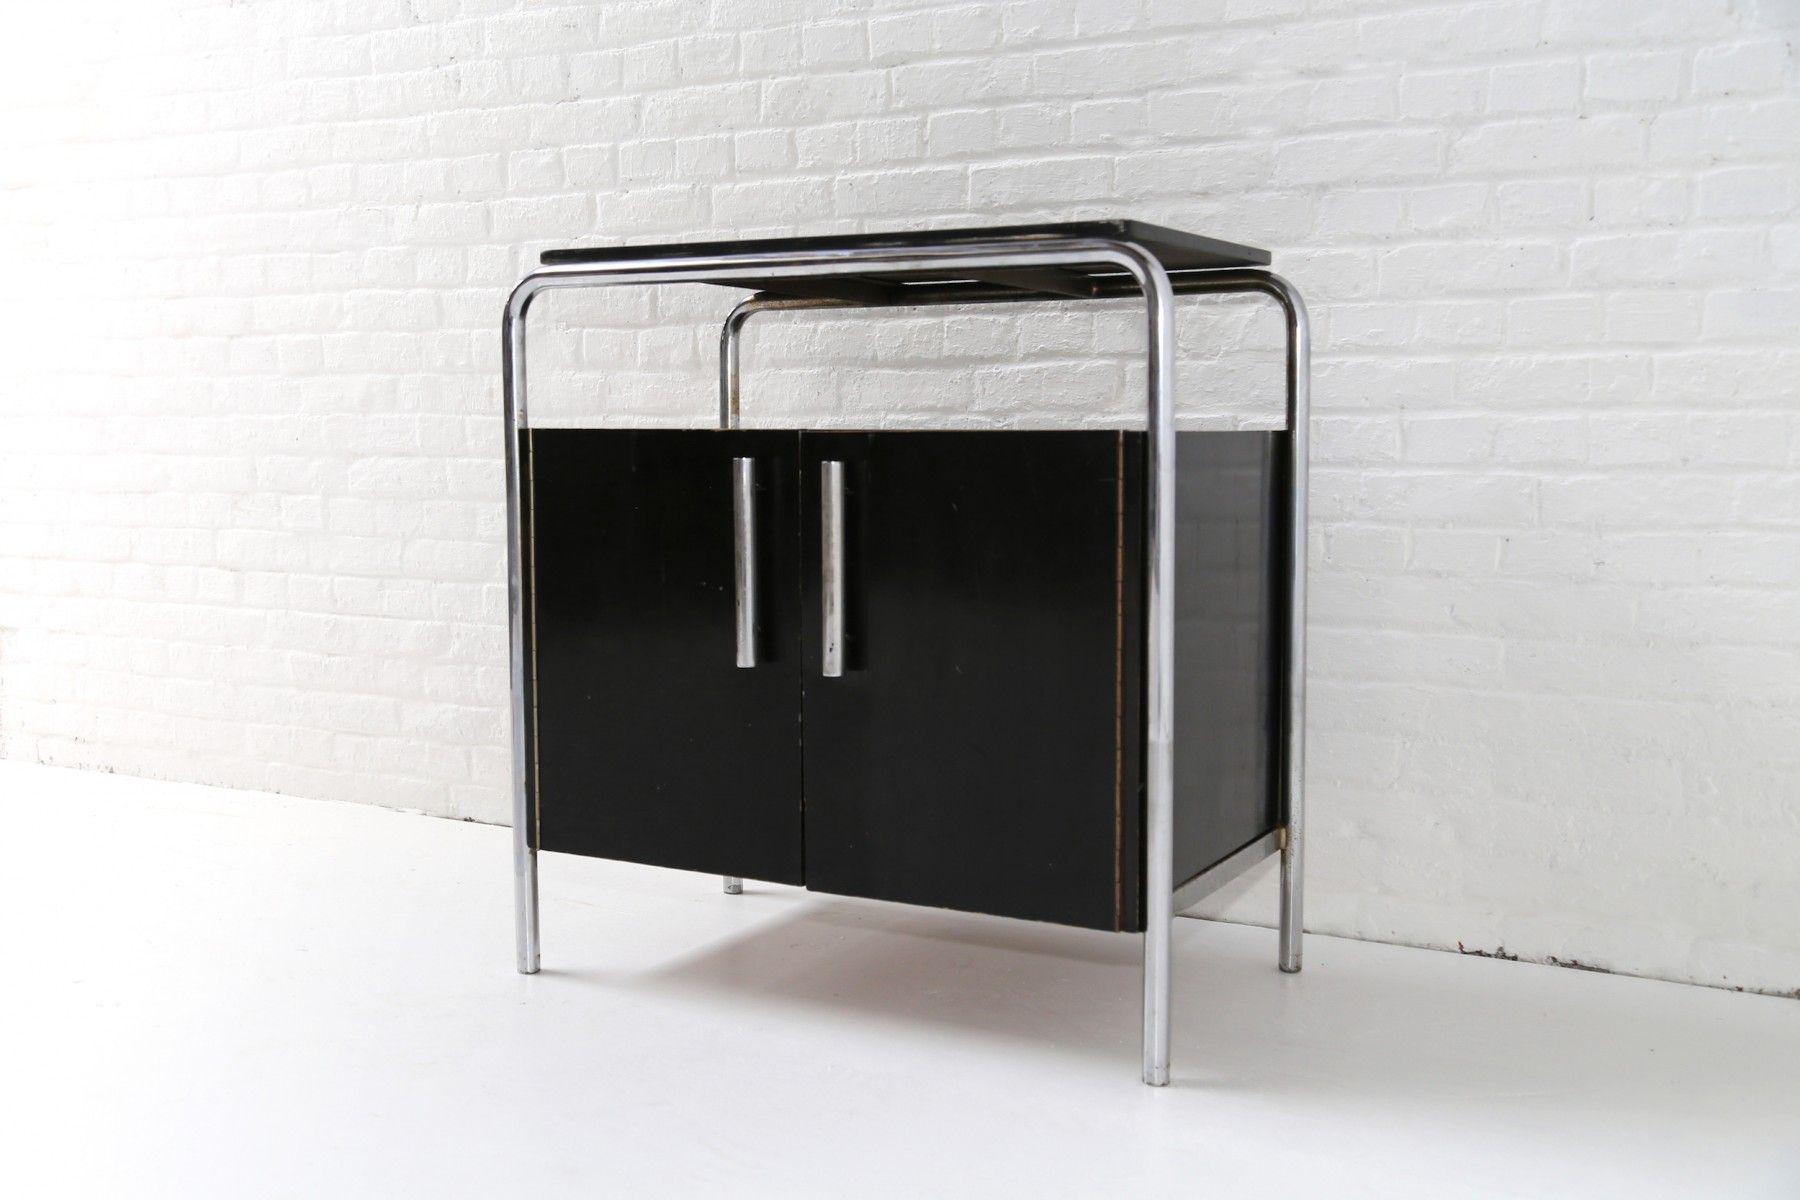 Vintage Bauhaus Cabinet By Bruno Weil For Thonet 1932 Cabinets  # Muebles Bauhaus Caracteristicas